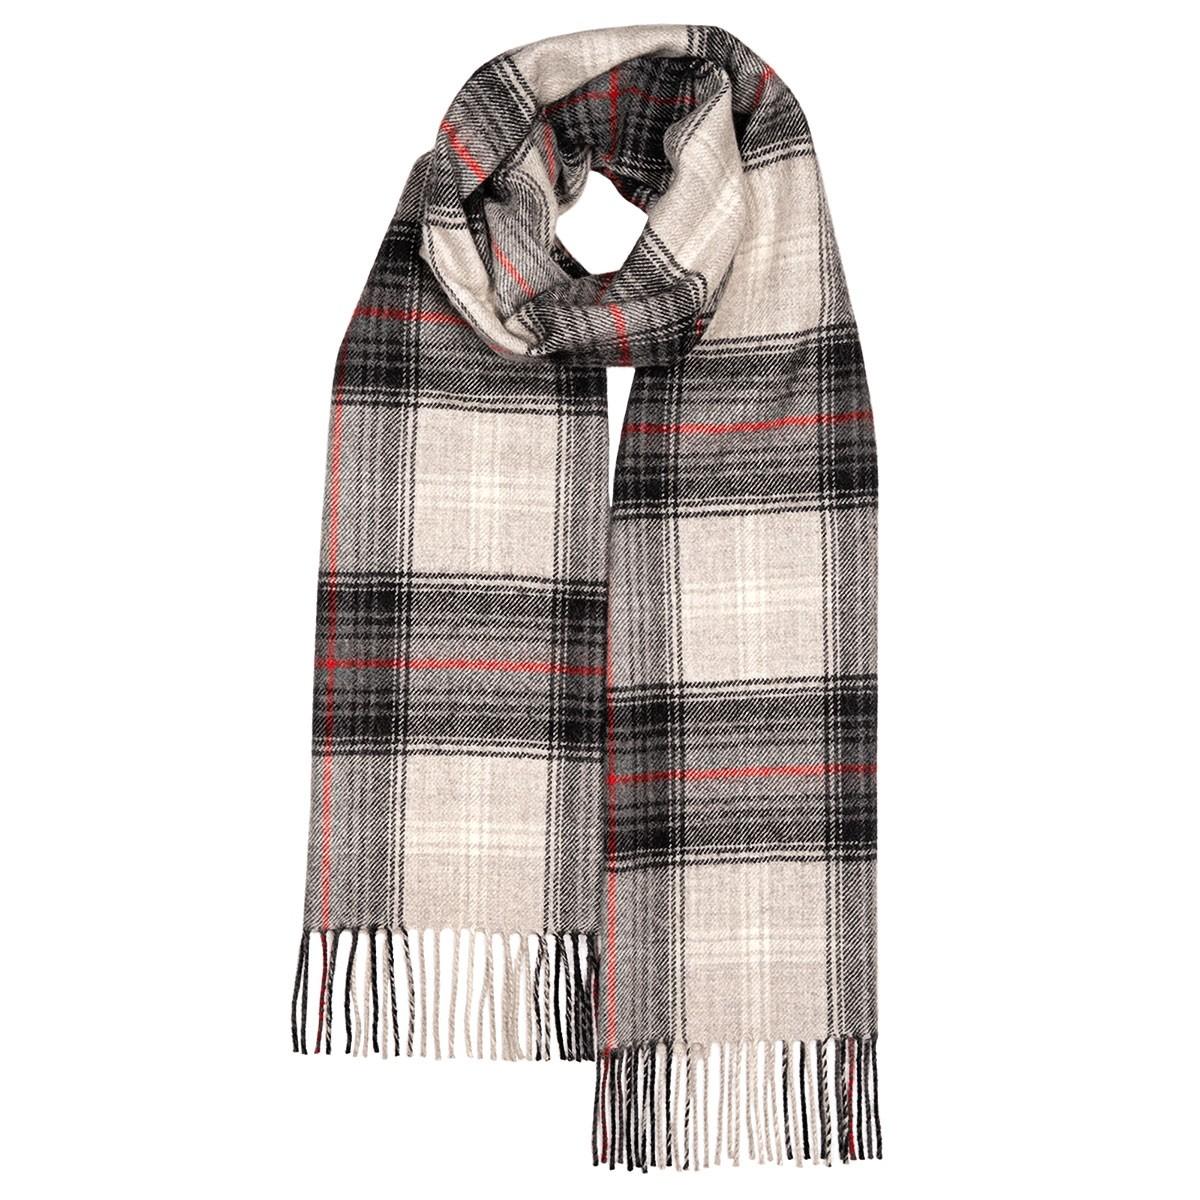 Darwin Lochcarron Graphite Luxury Oversized Lambswool Scarf